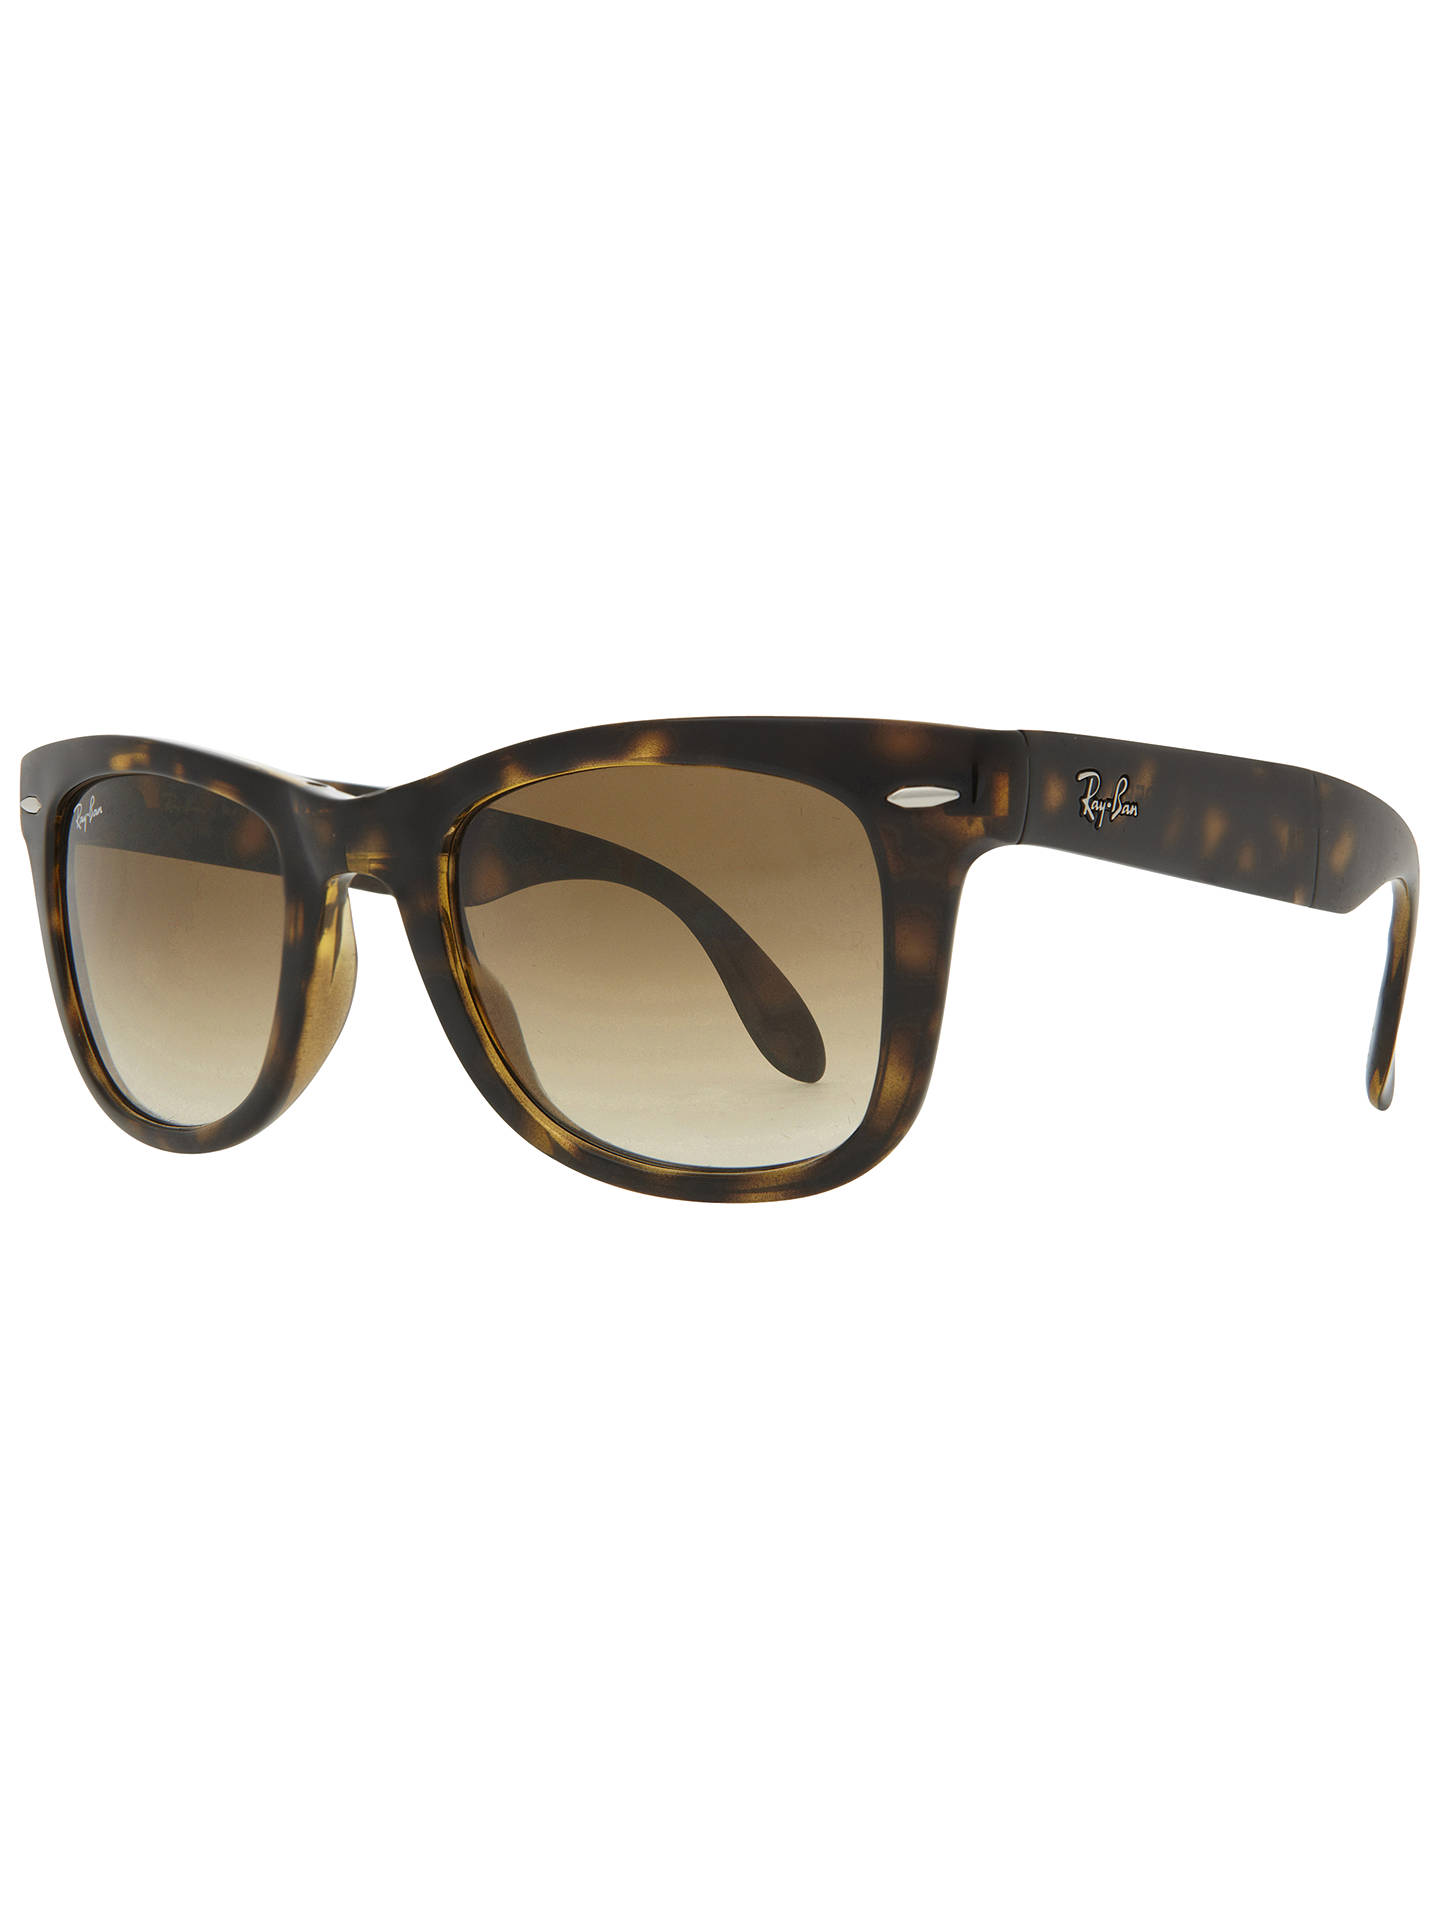 9eb653f0f5 BuyRay-Ban RB4105 Folding Wayfarer Sunglasses